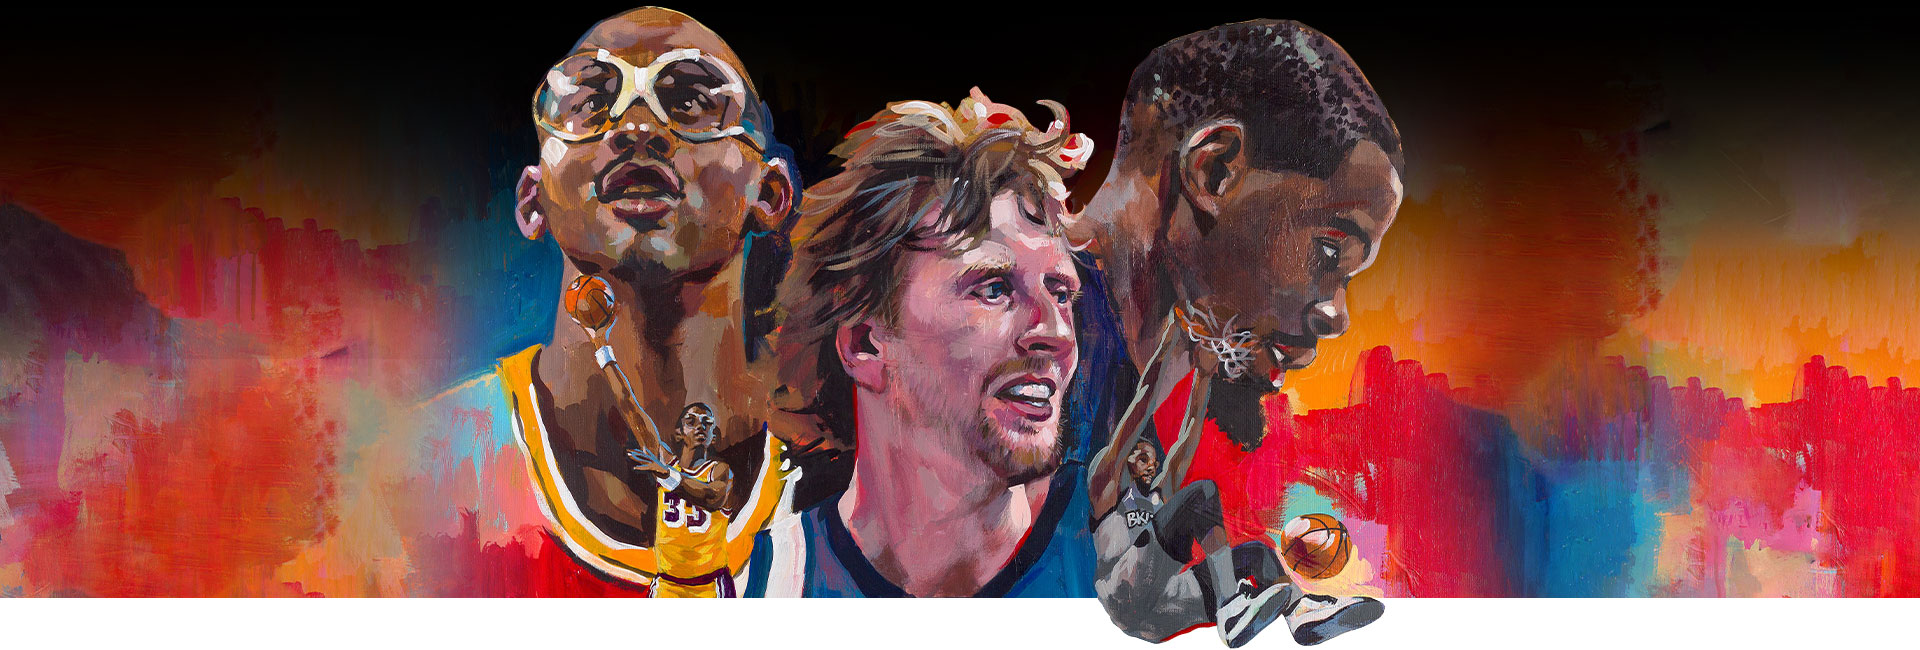 Artist renditions of Kareem Abdul Jabbar, Dirk Nowitzki and Kevin Durant.